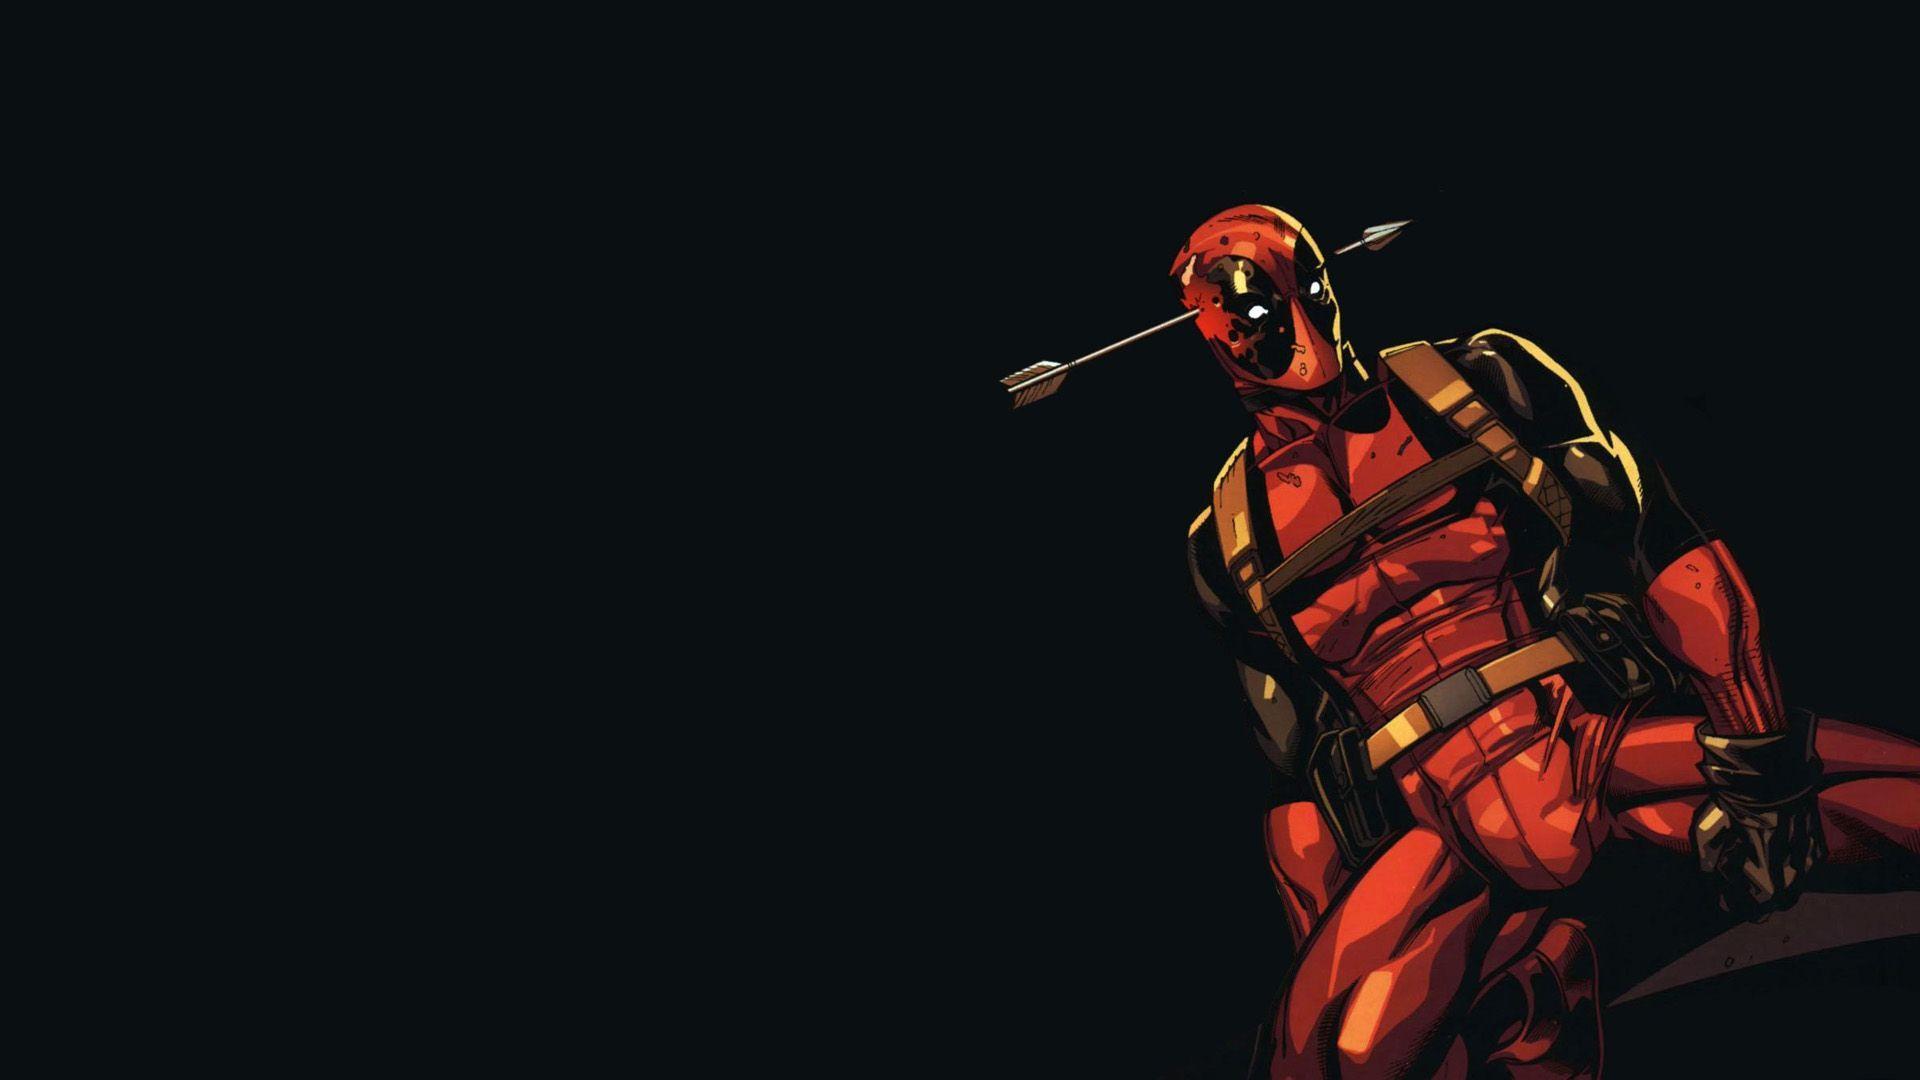 Deadpool Windows Wallpapers Top Free Deadpool Windows Backgrounds Wallpaperaccess